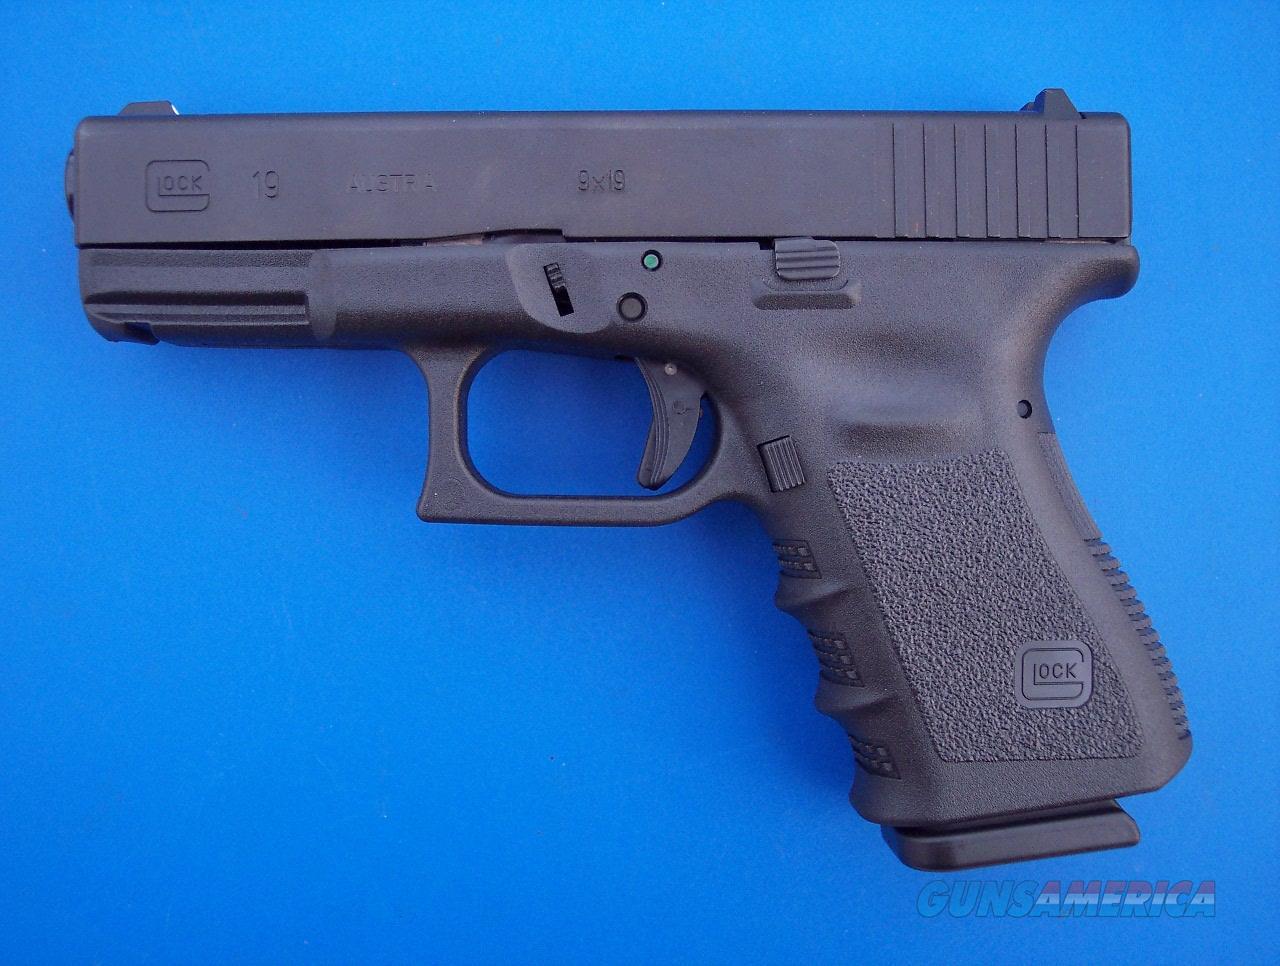 Glock 19 9mm 10 Rd Gen 3 Compact CCW *NEW*   Guns > Pistols > Glock Pistols > 19/19X